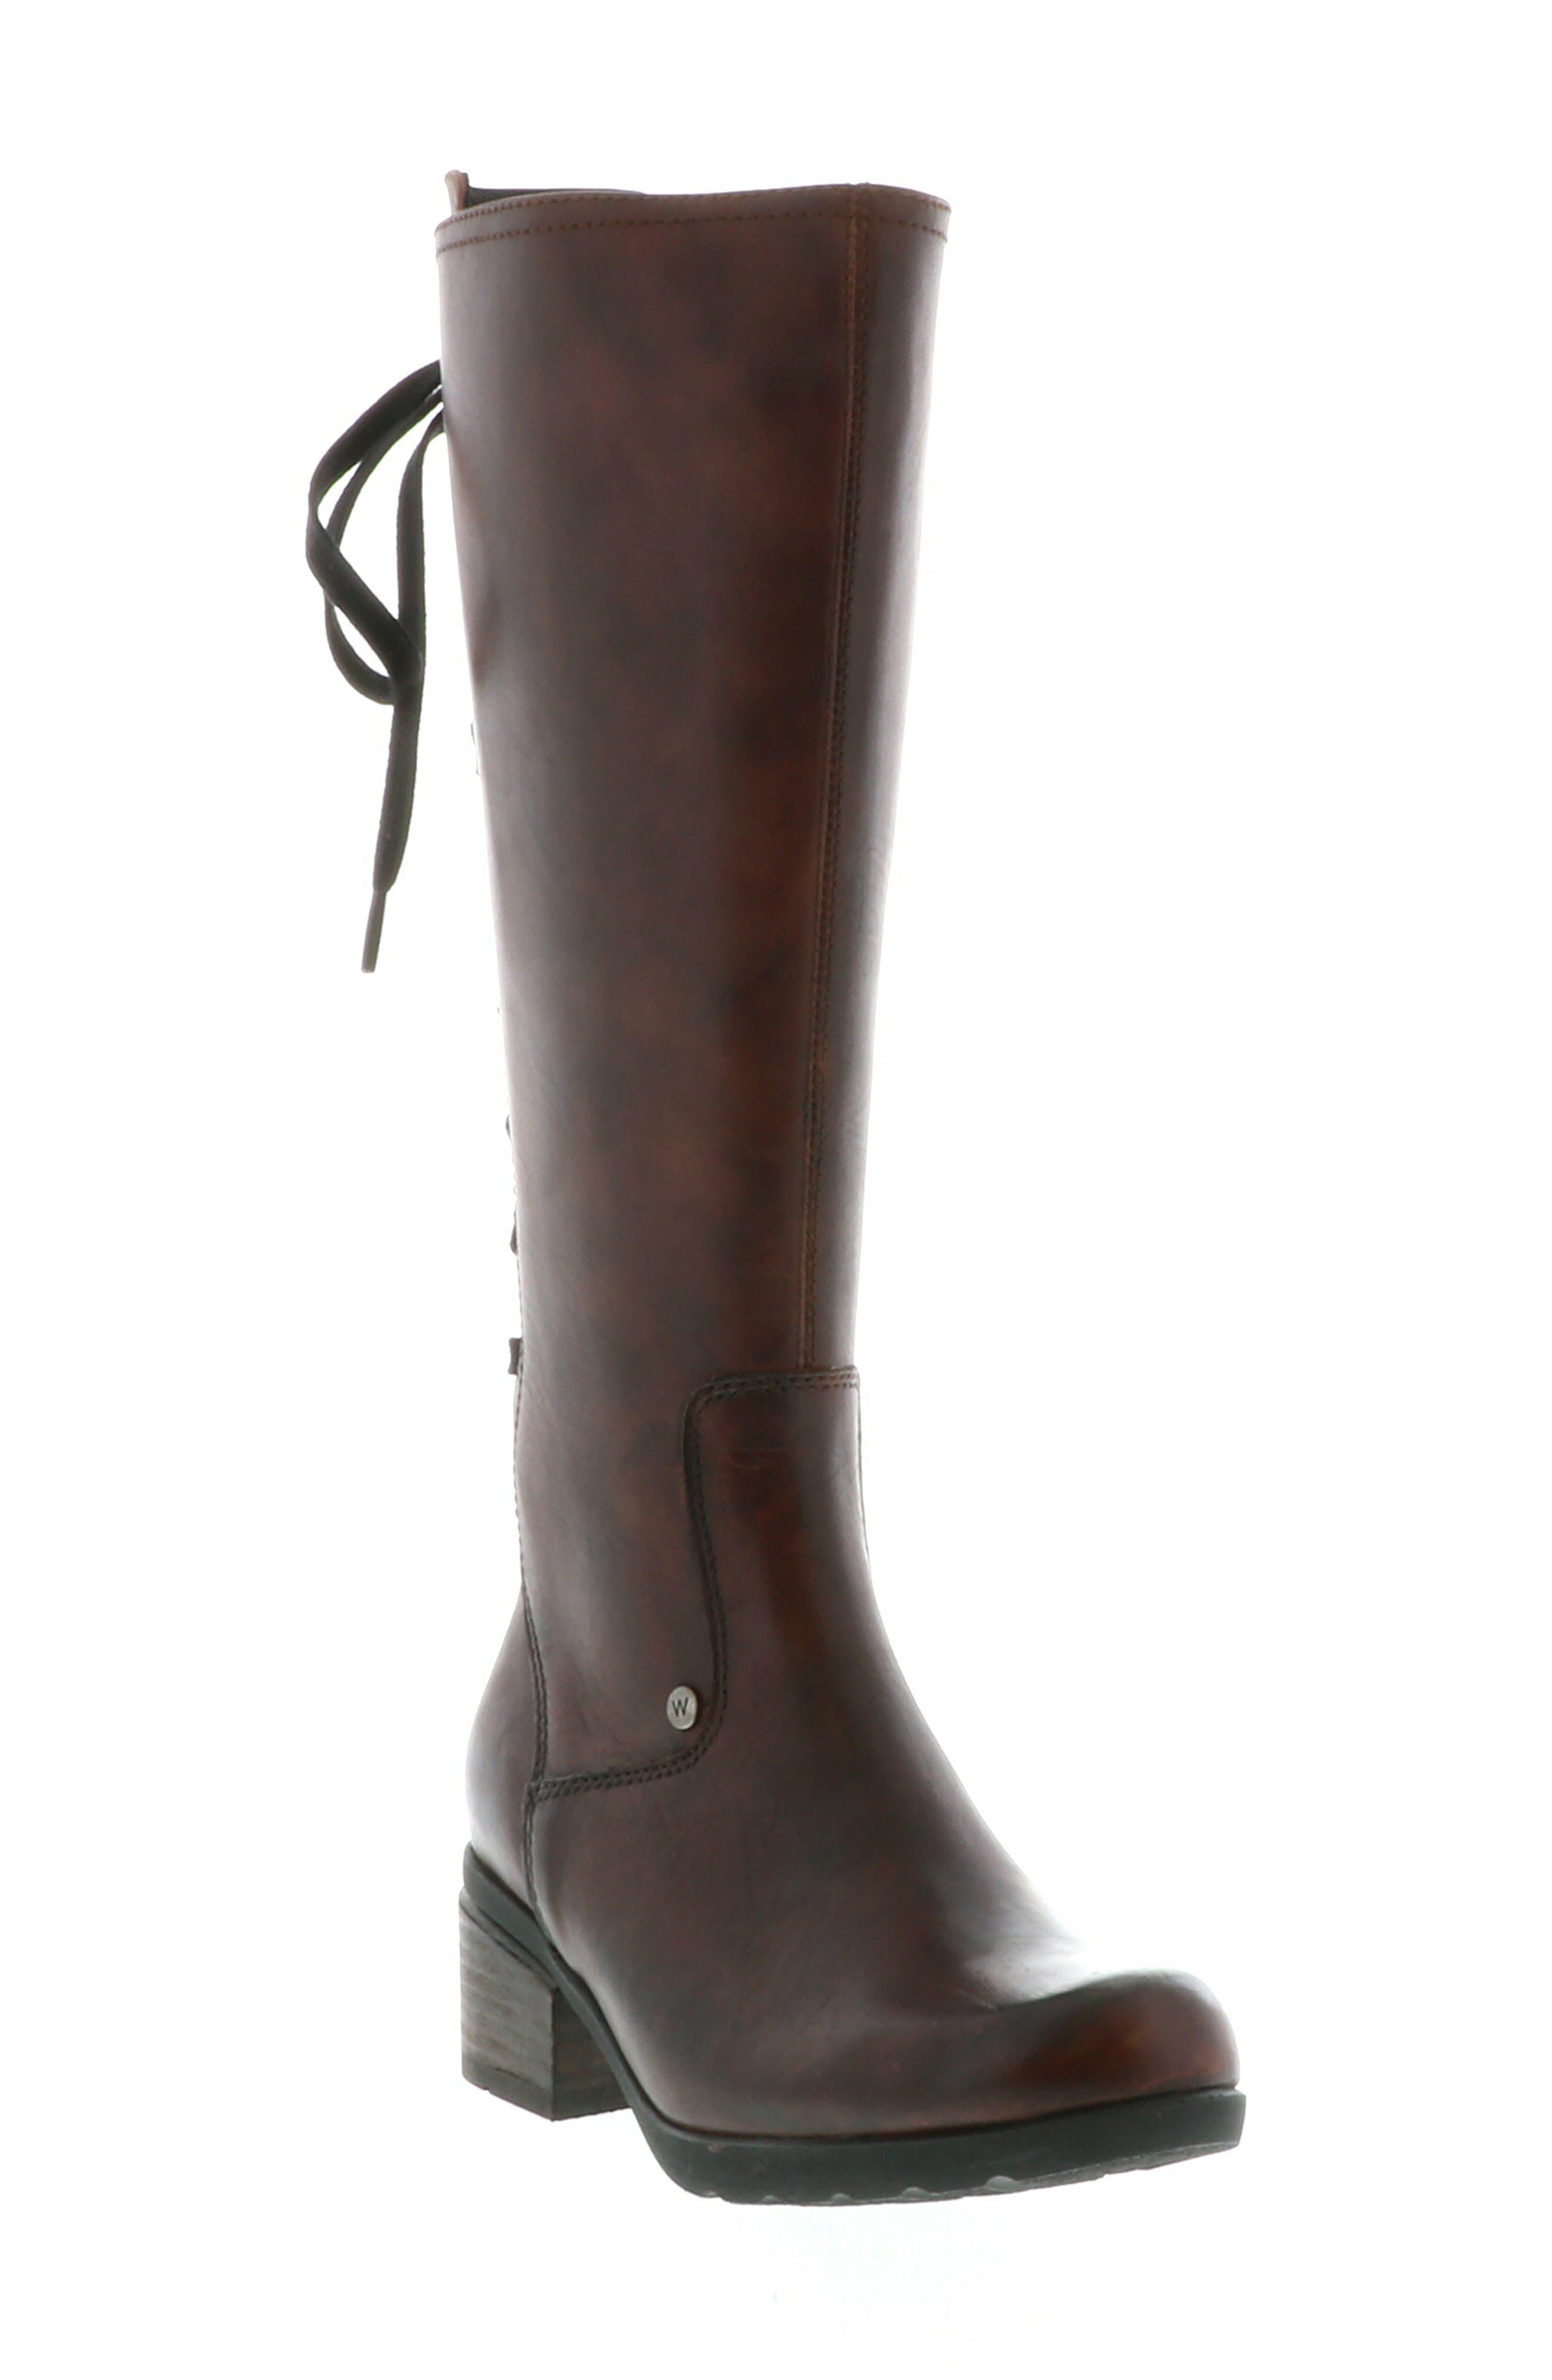 Wolky Hayen Knee High Boot, Brown